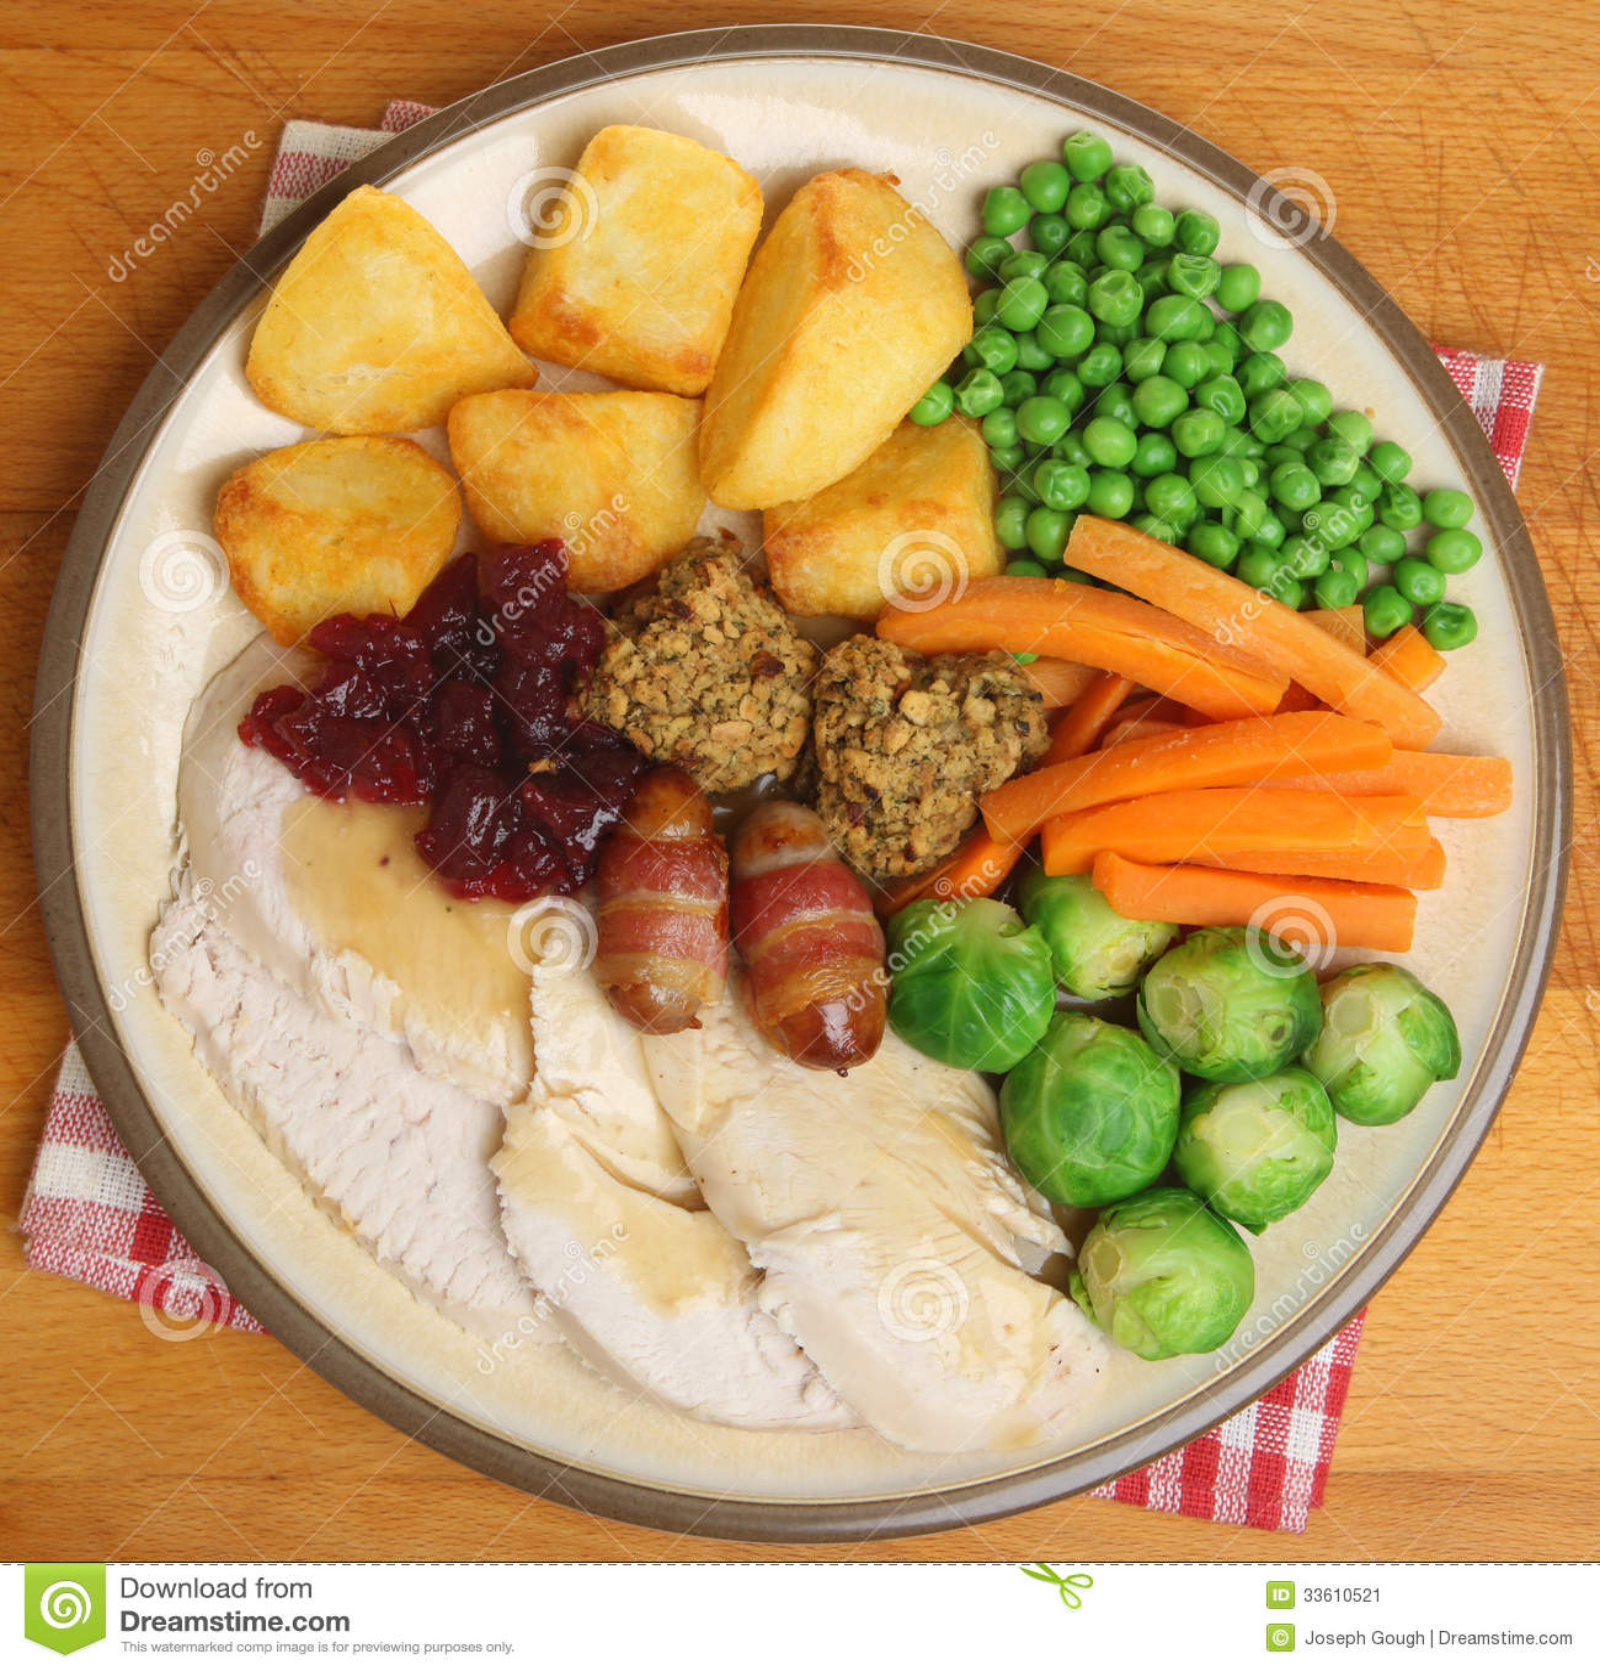 Roast Turkey Christmas Dinner Stock Image - Image: 33610521